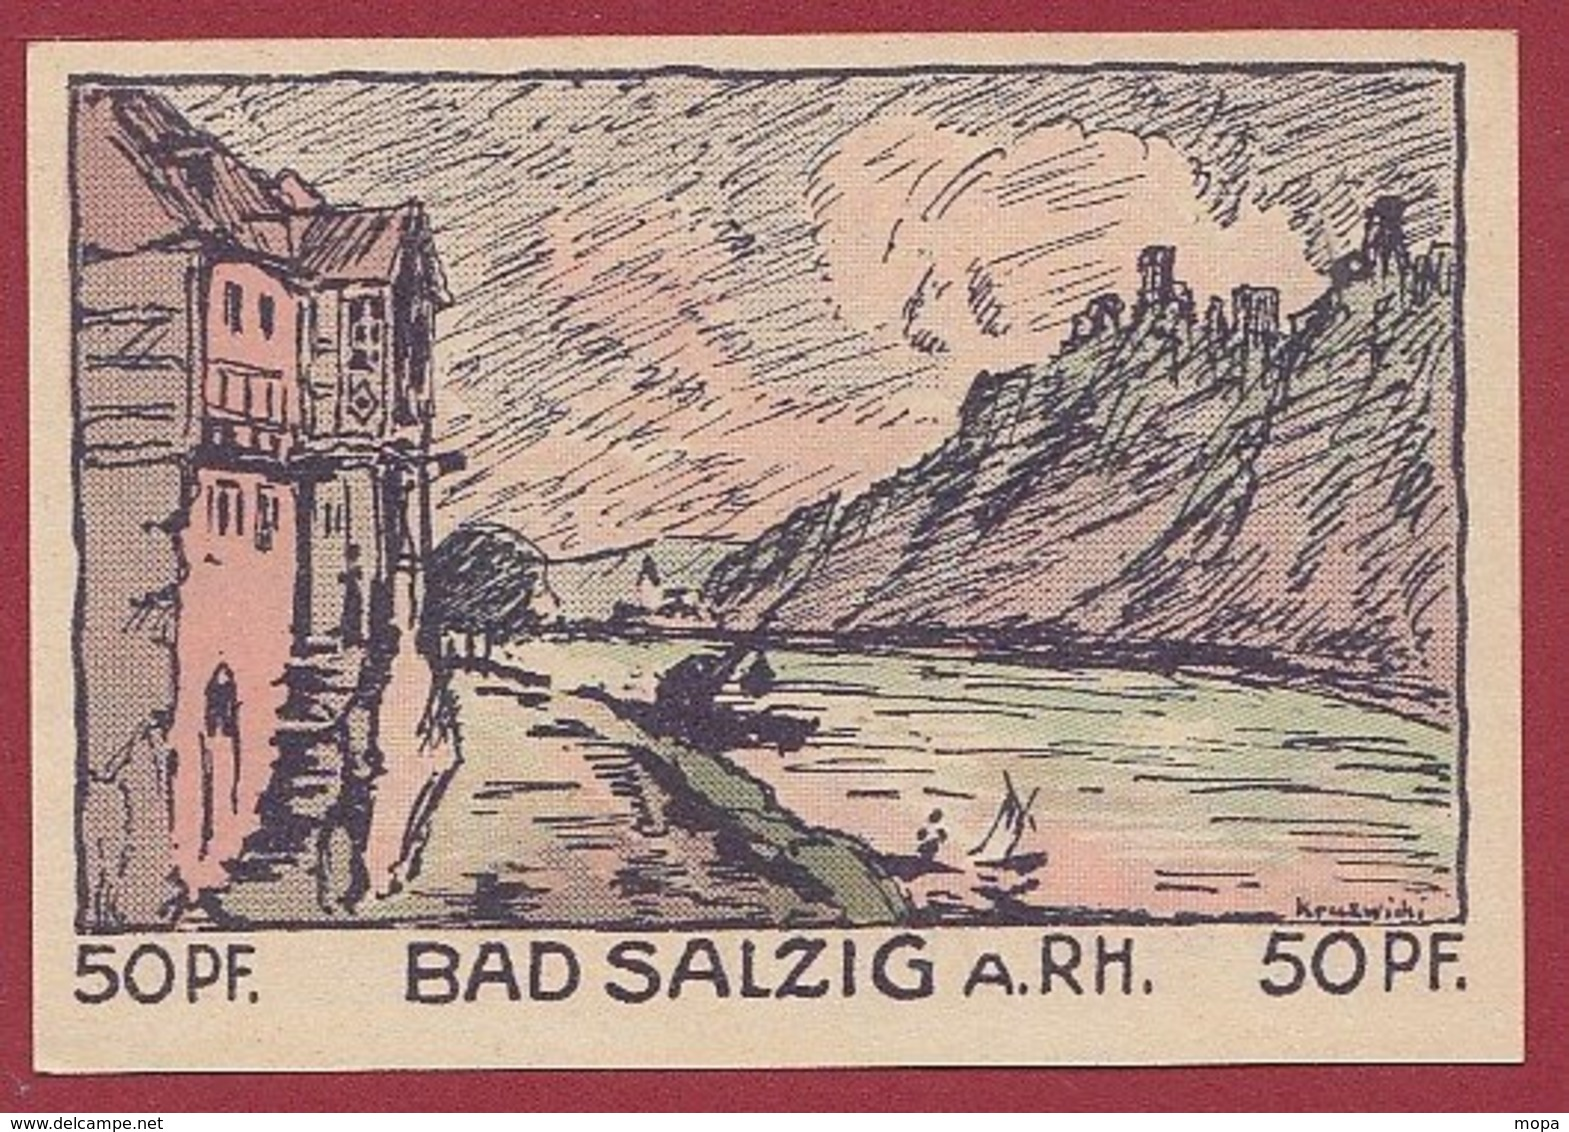 Allemagne 1 Notgeld De 50 Pfenning Stadt Salzig/A/Rhein   Dans L 'état N °4812 - Collections